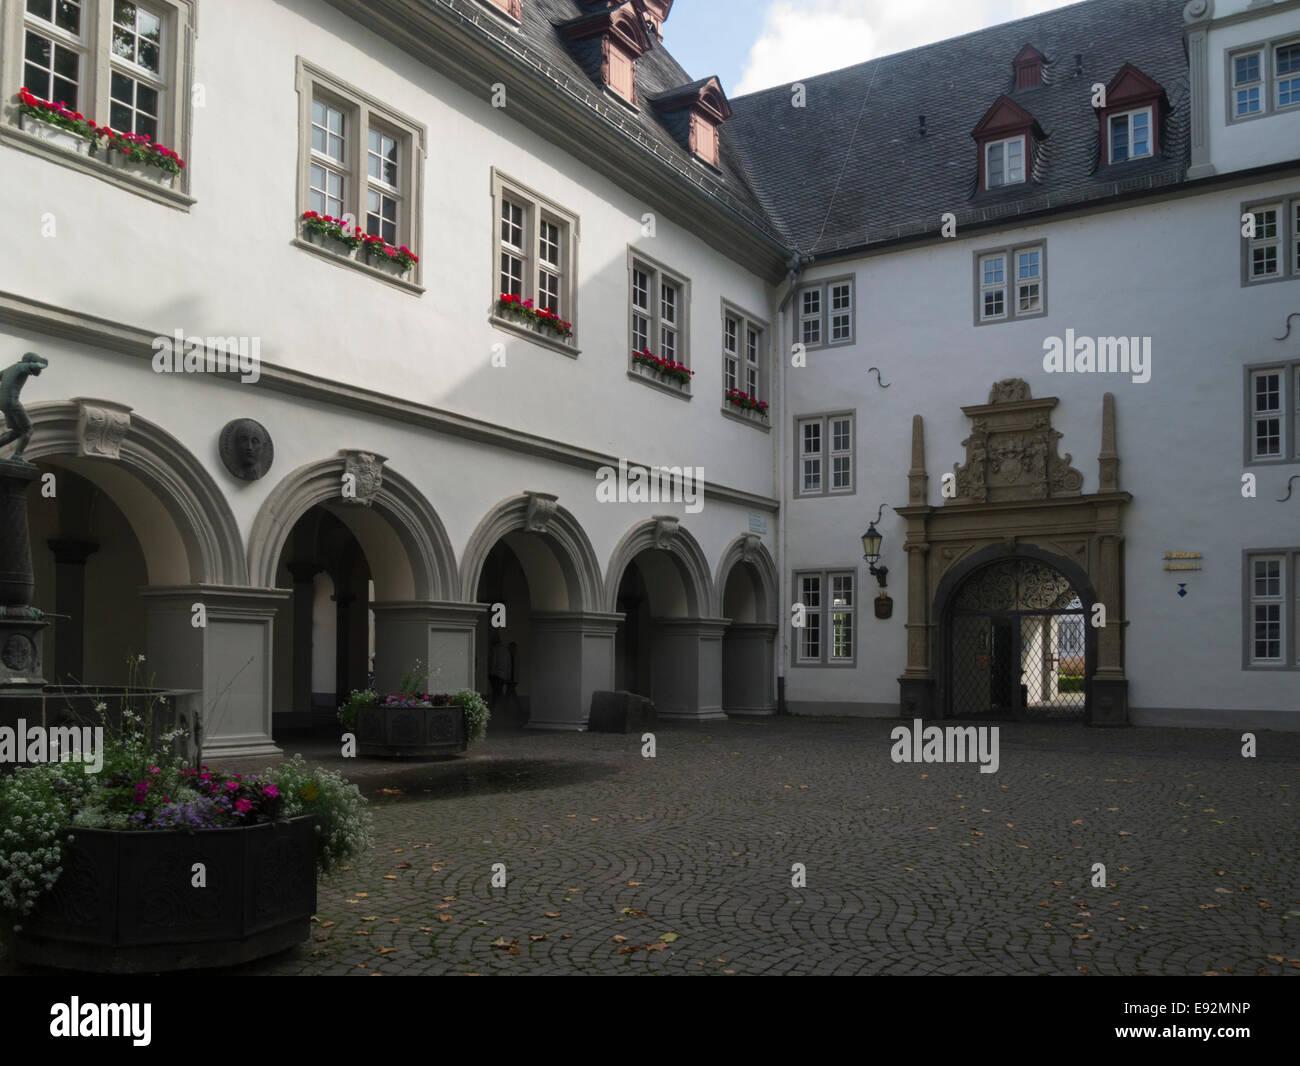 Koblenz Rathaus Town Hall Germany EU Jesuiten Platz an old historic city Rhine Gorge UNESCO World Heritage Site Stock Photo